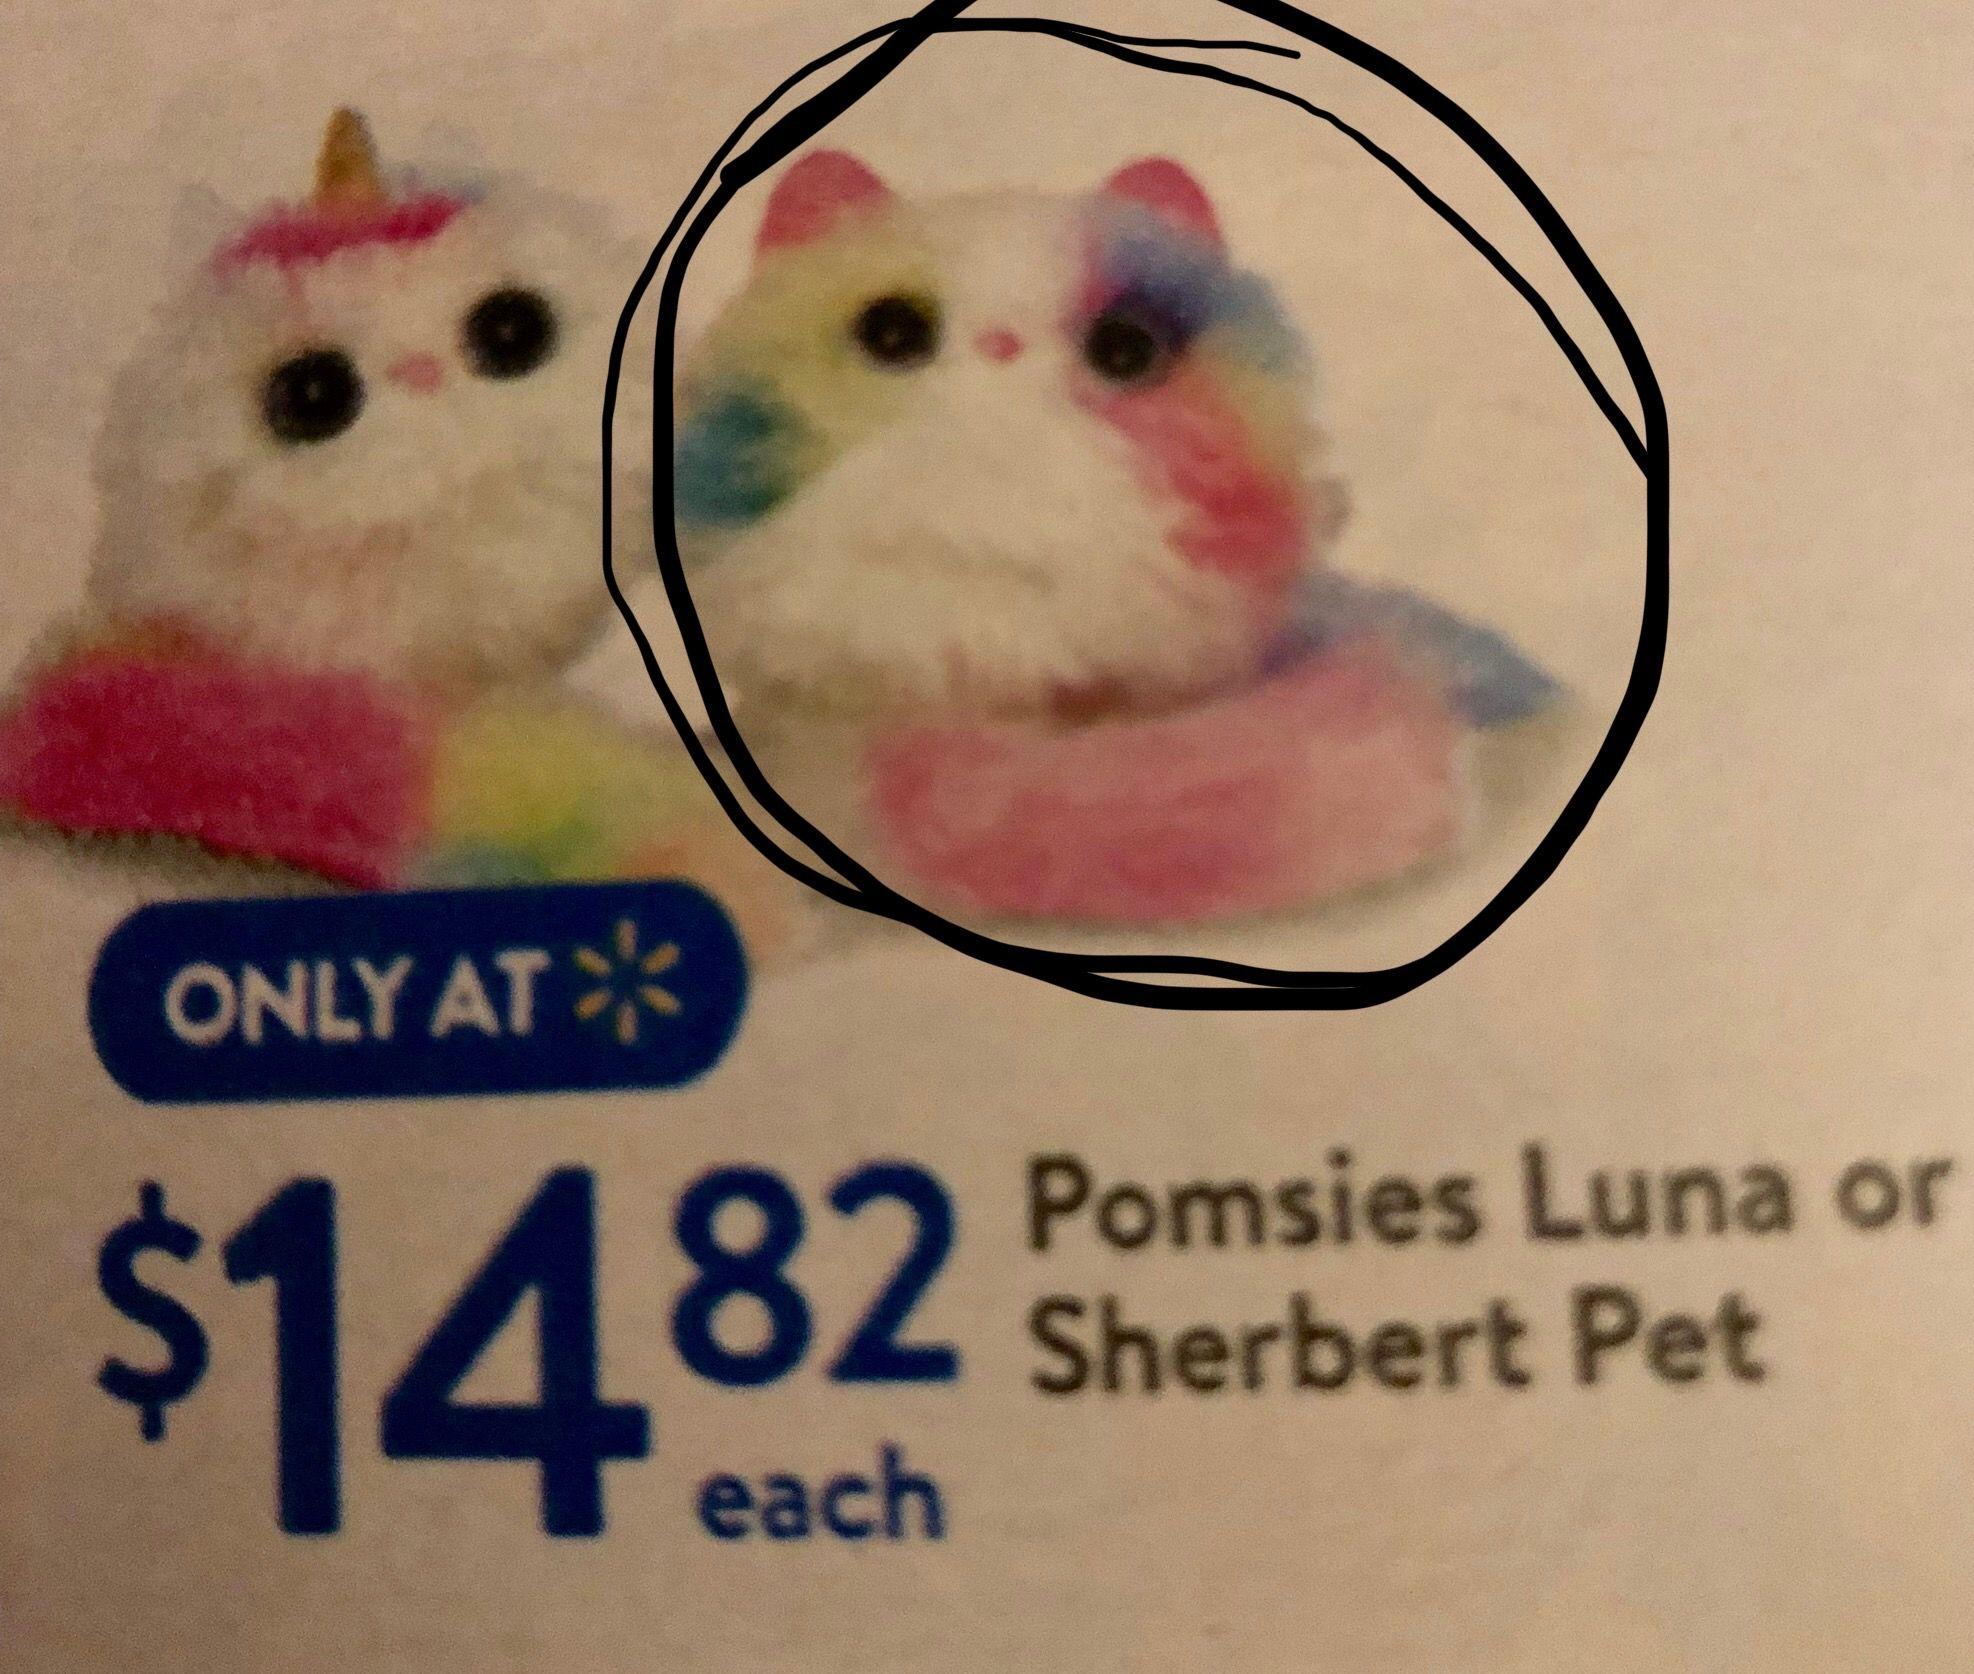 WALMART - Pomsies Luna or Sherbert Pet - $15 (the one she